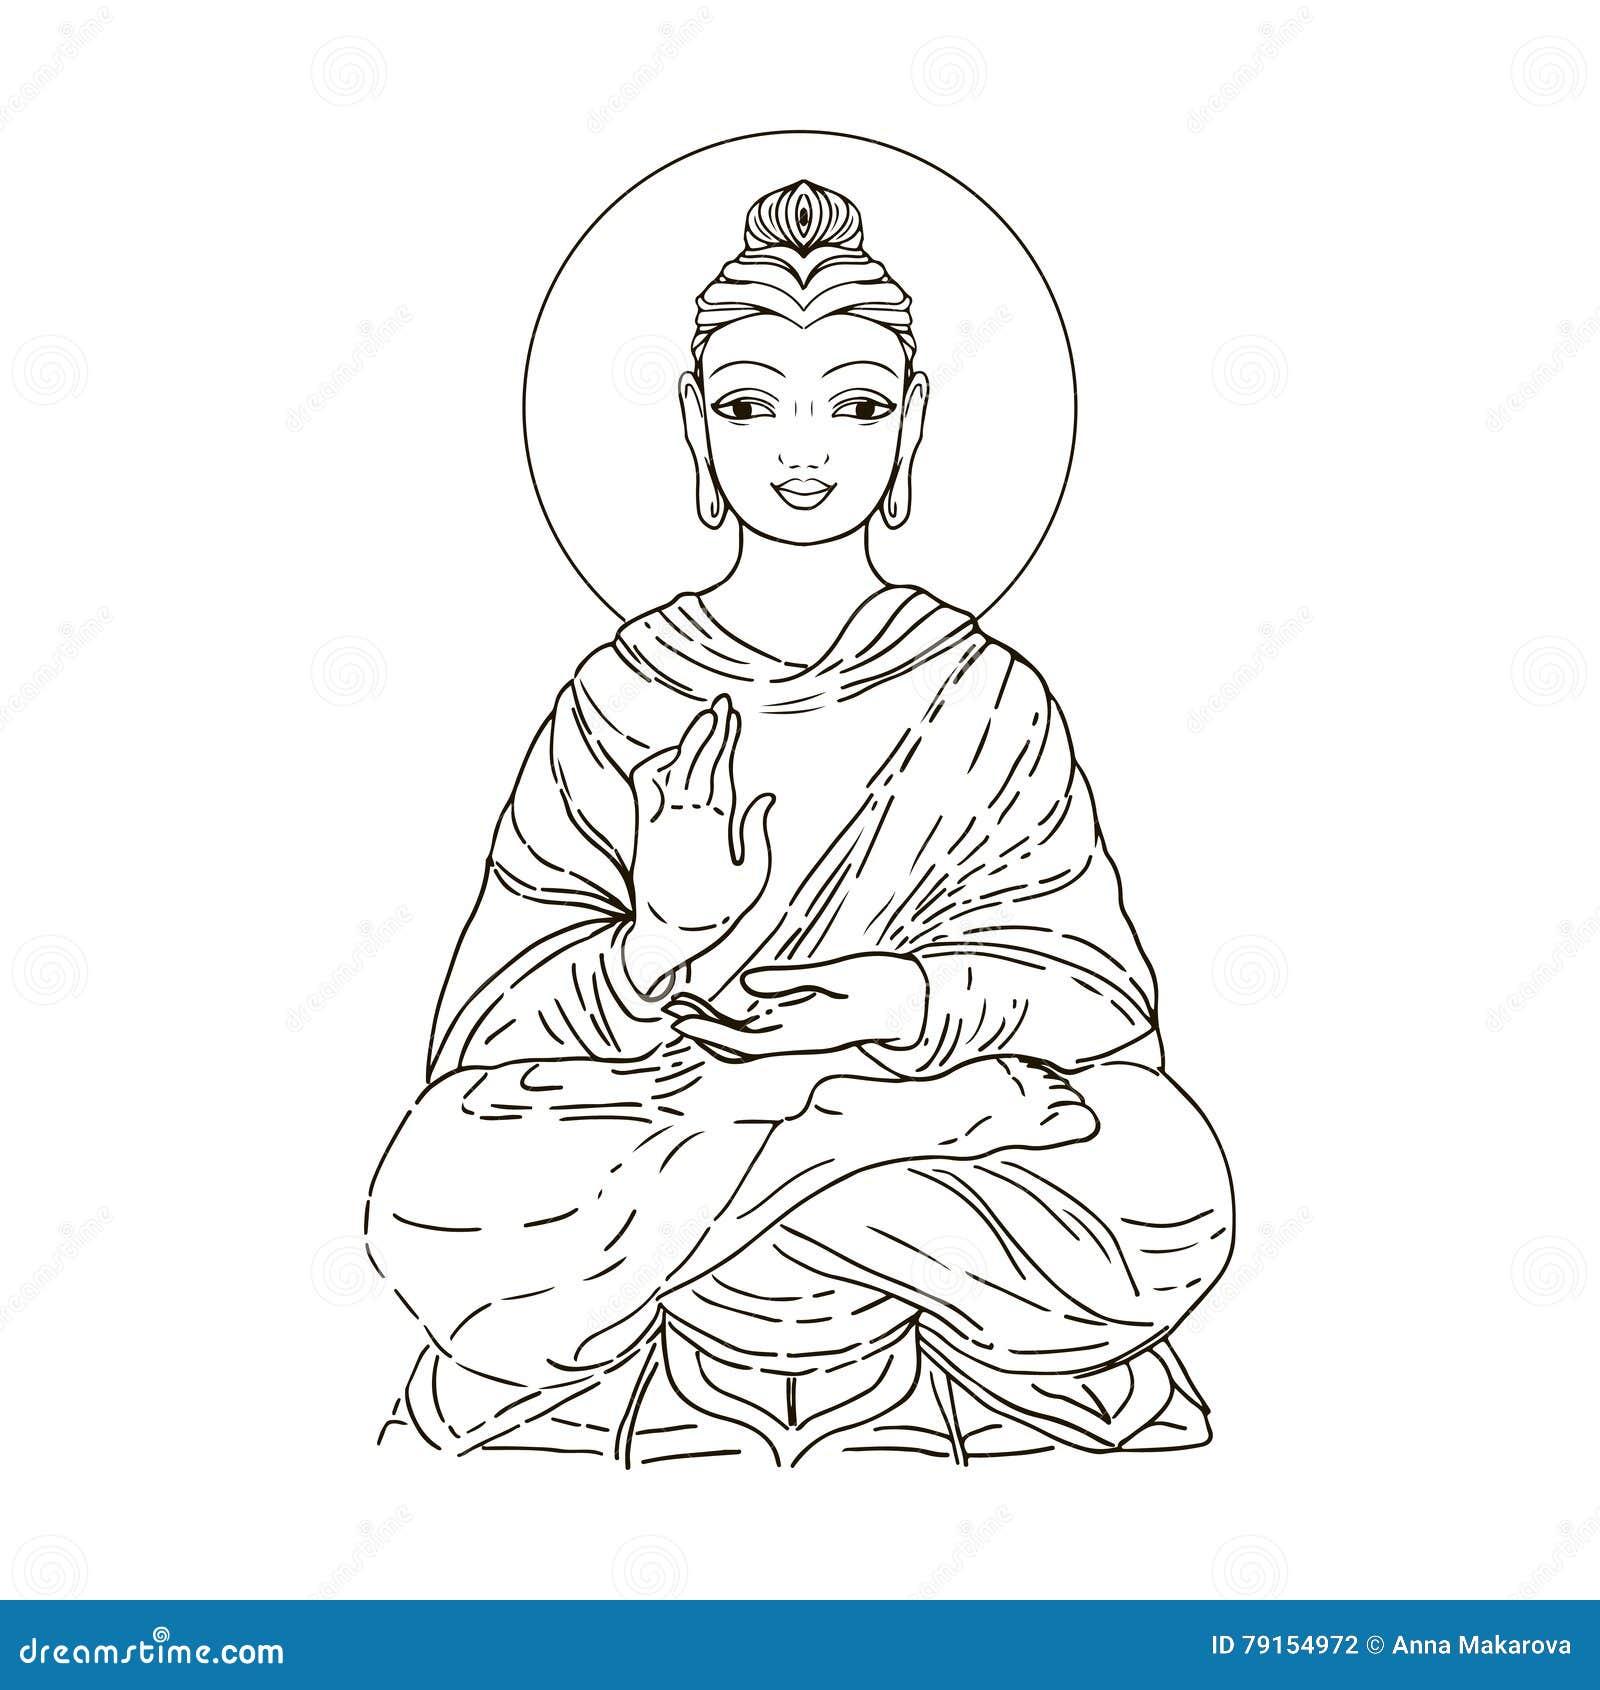 d2b0633e83a18 Sitting Buddha isolated on white. Esoteric vintage illustration. Indian,  Buddhism, spiritual art